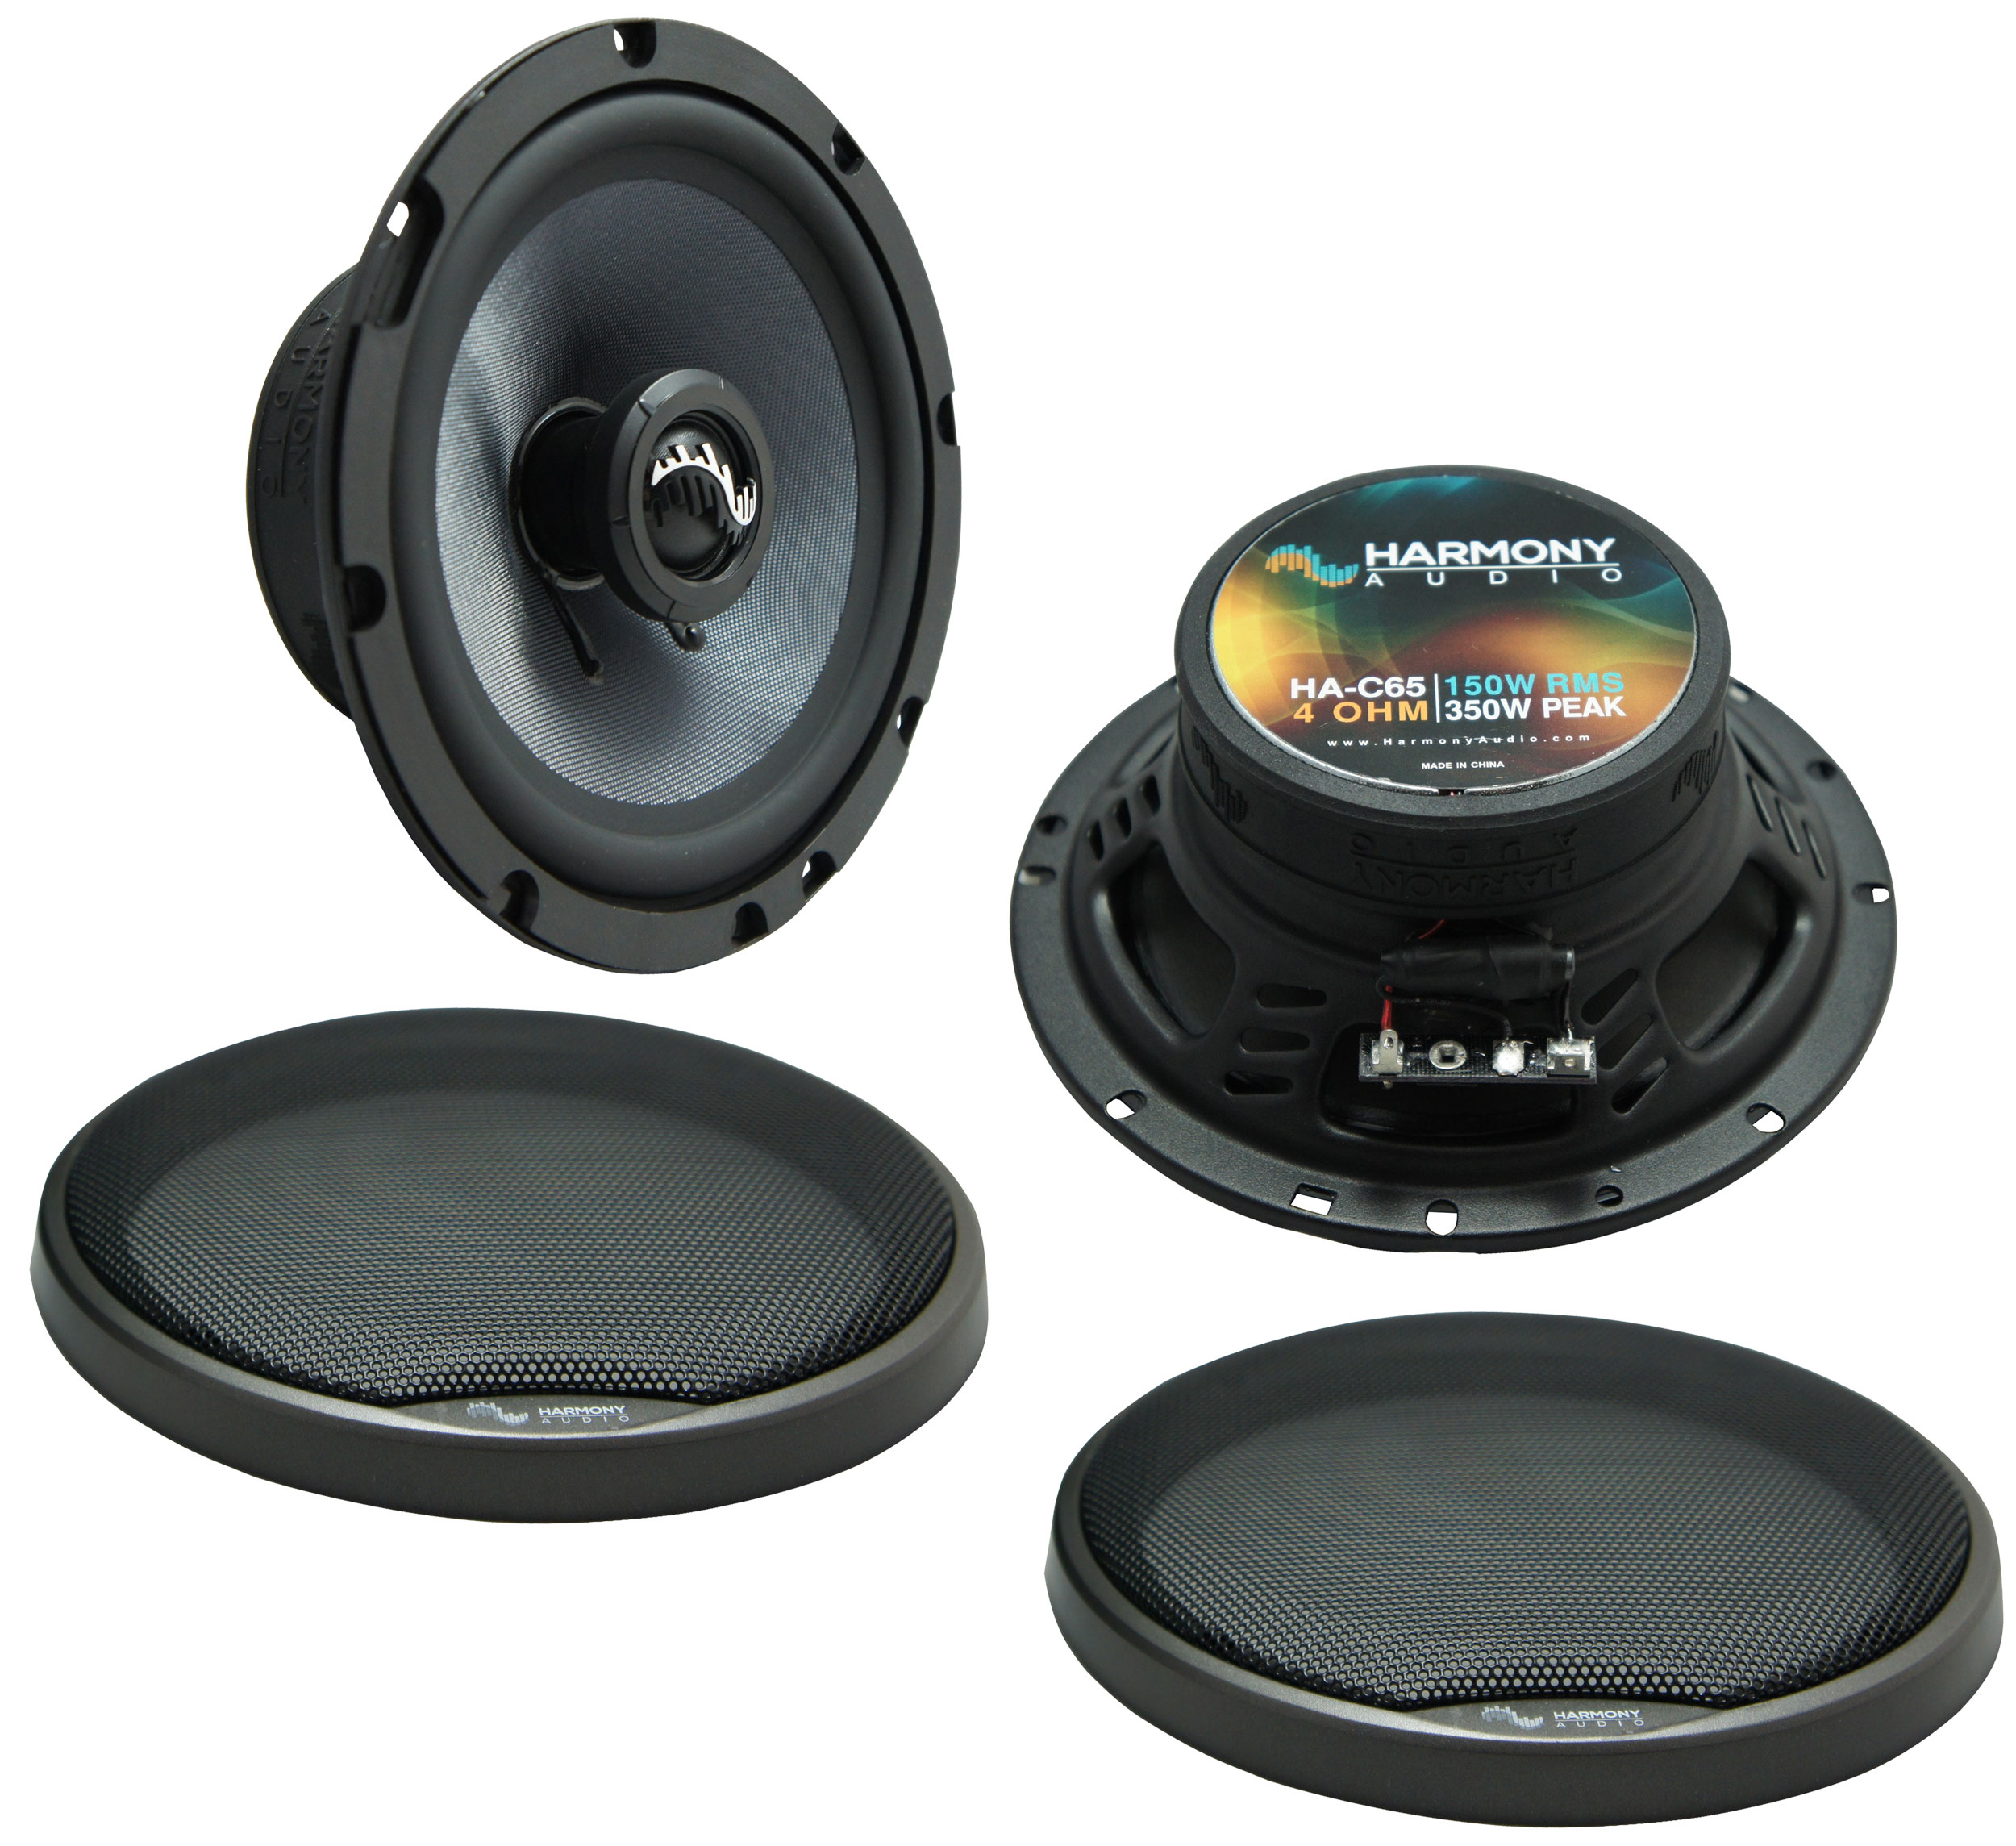 Fits BMW 3 Series 2007-2011 Rear Deck Replacement Harmony HA-C65 Premium Speakers New